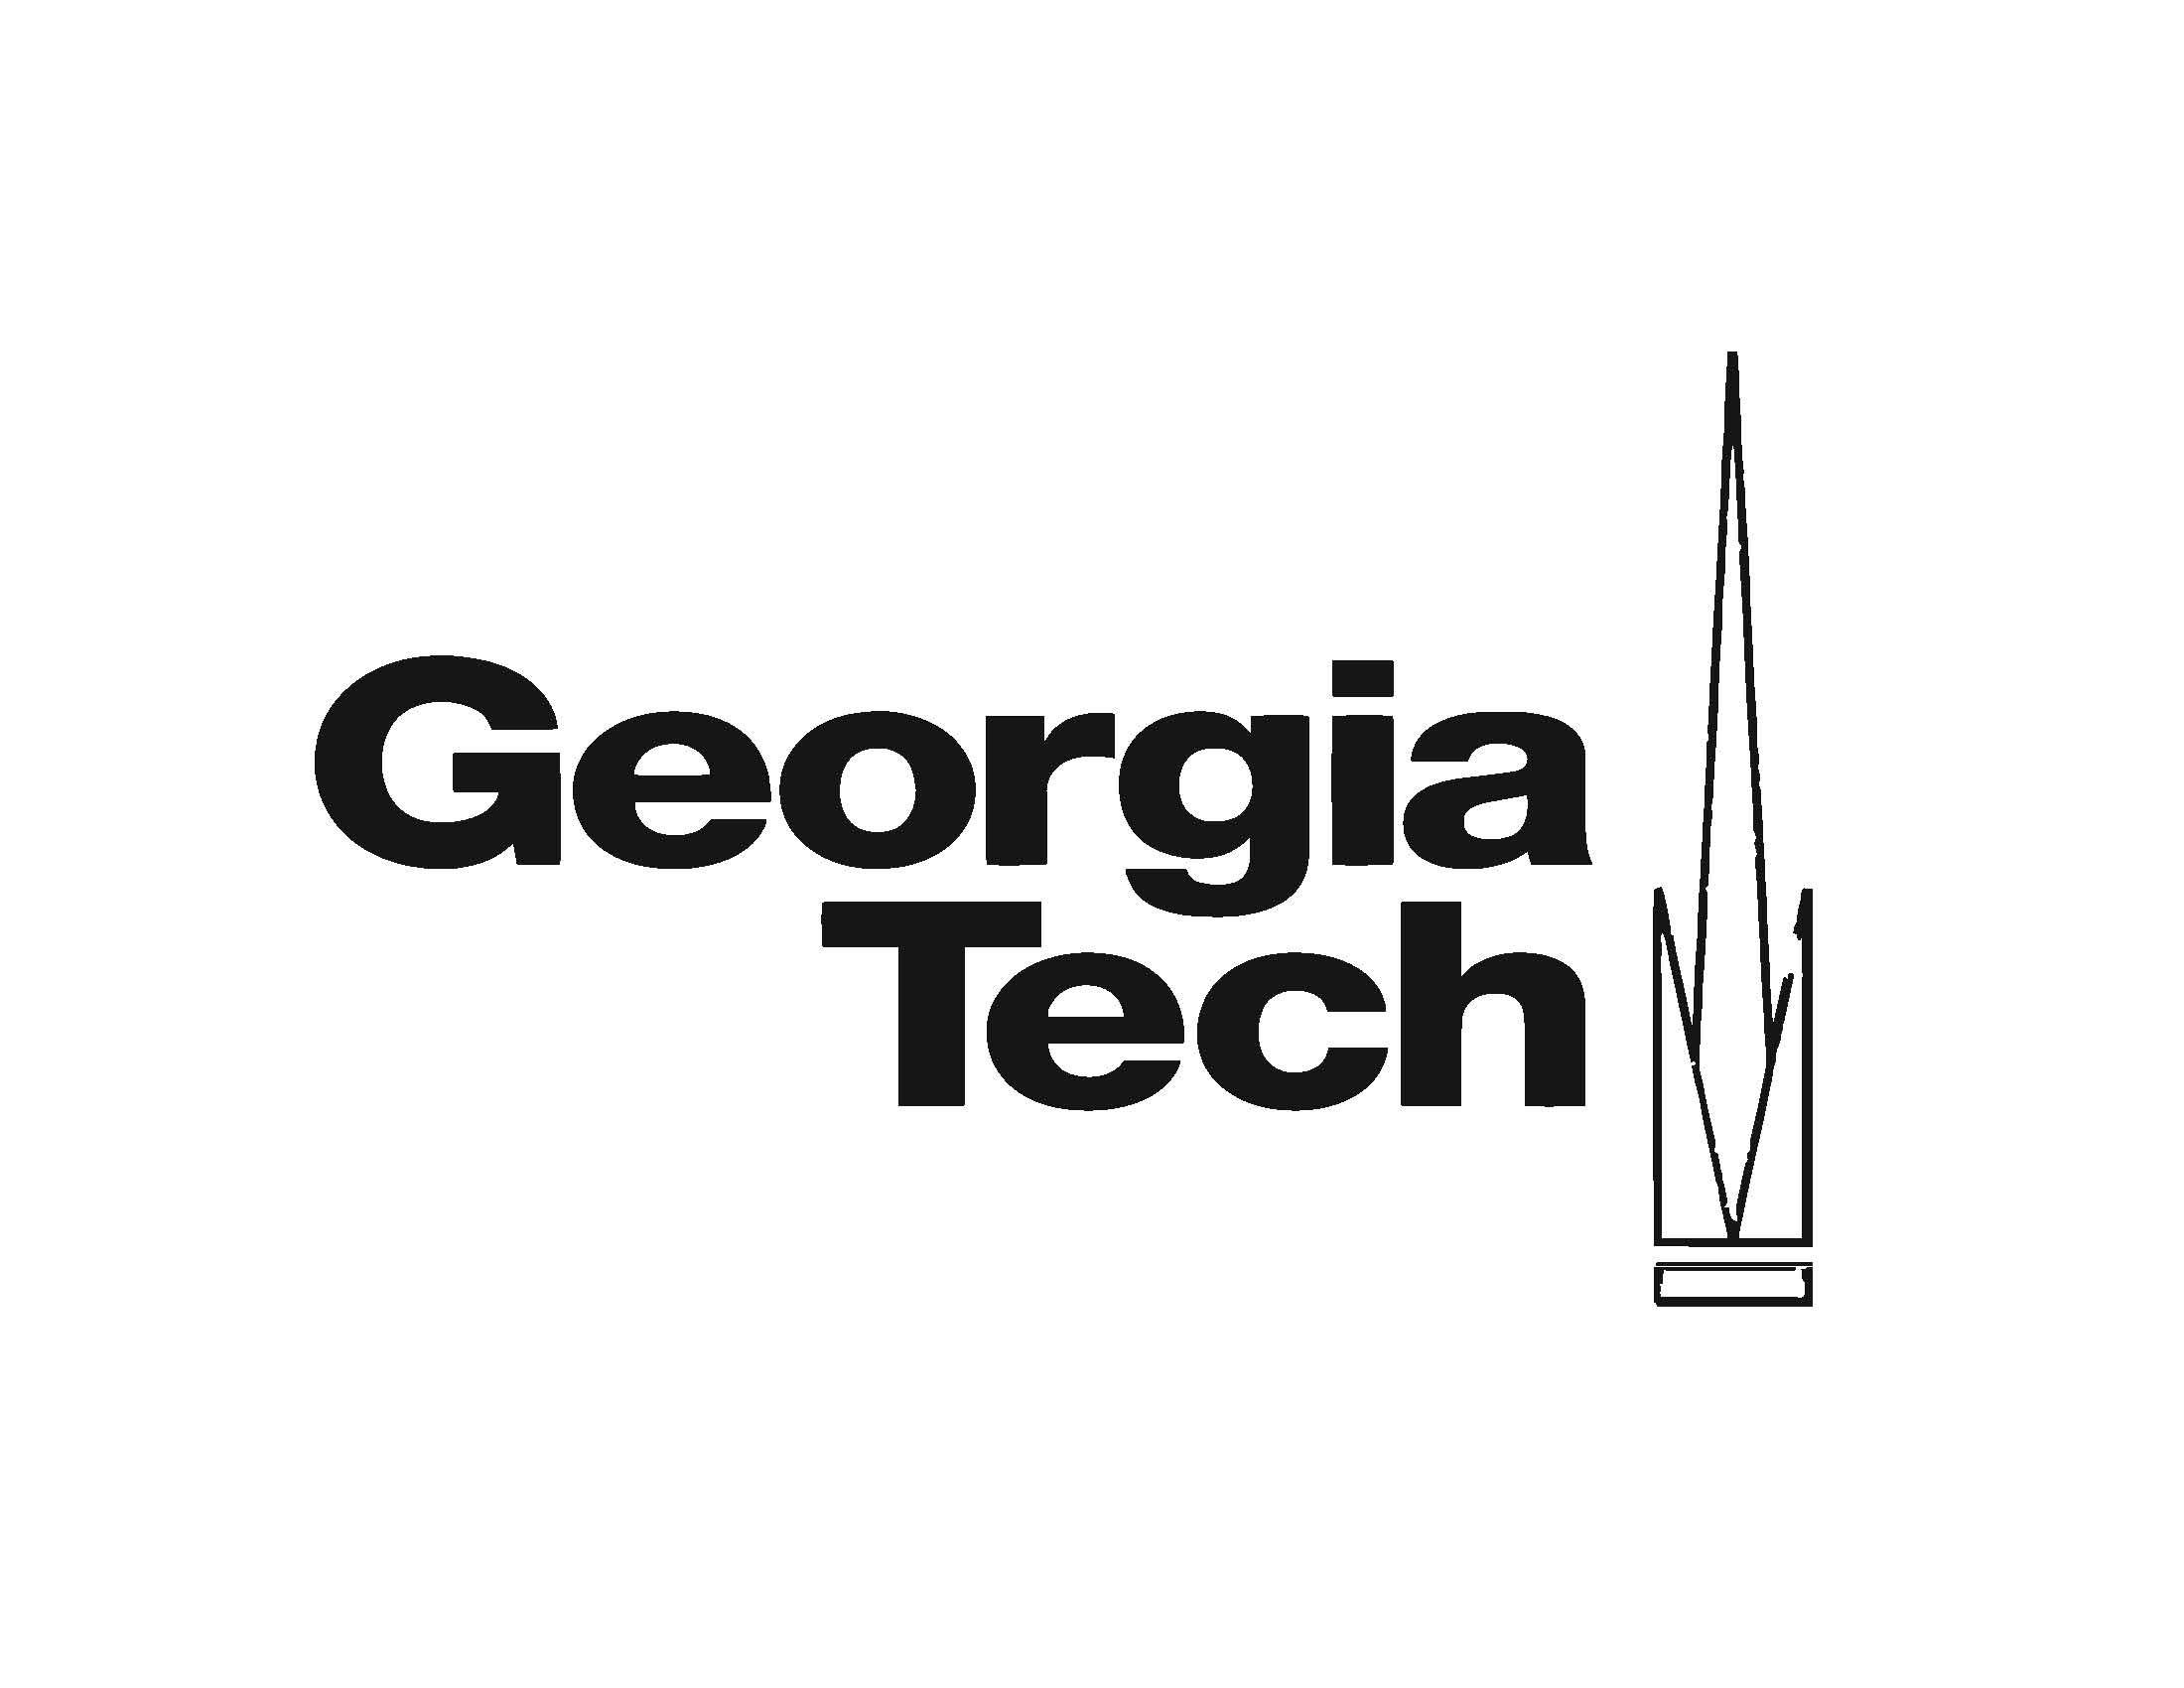 Georgia Tech Background Essay